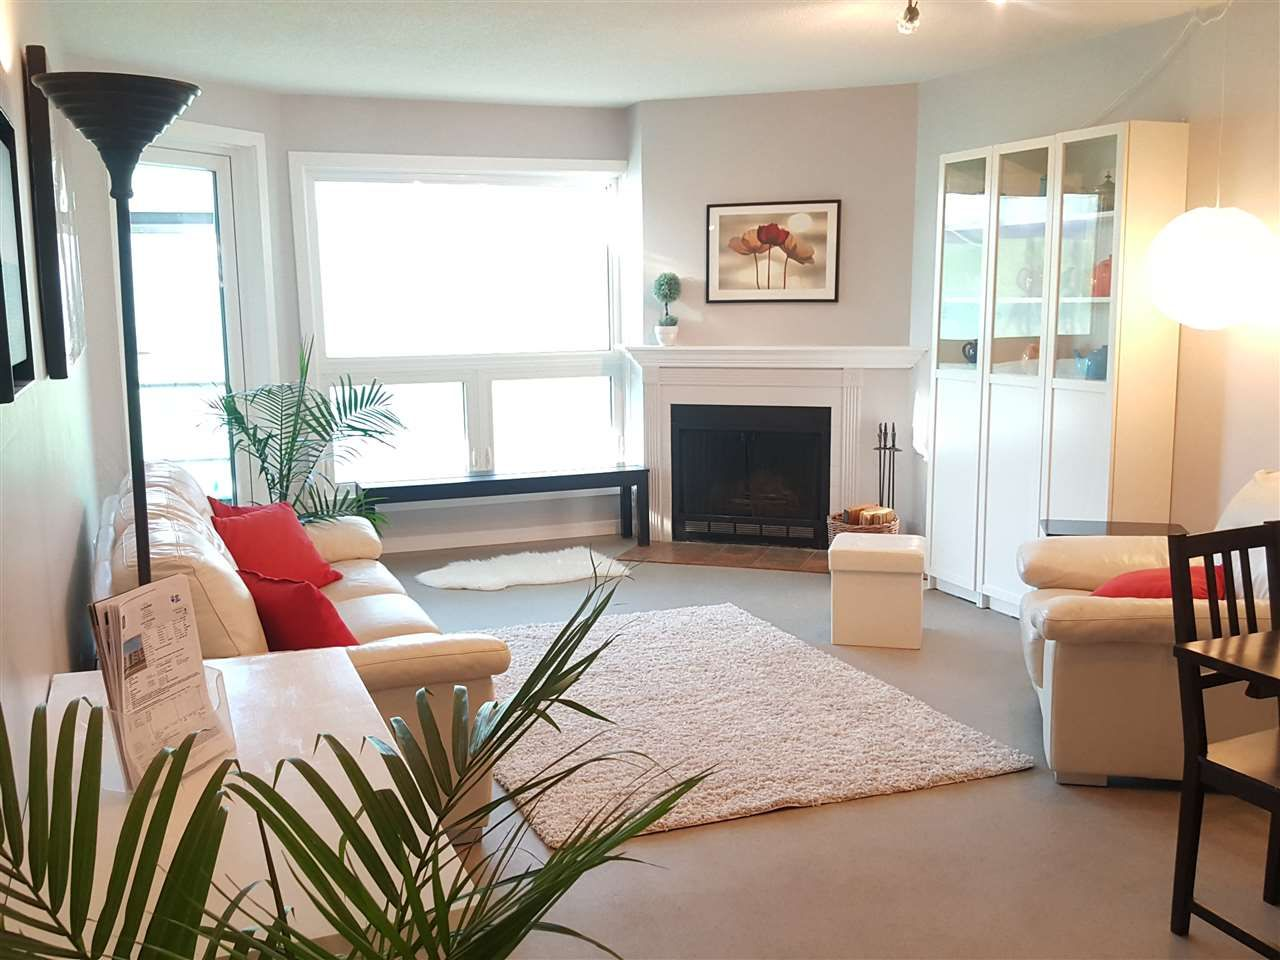 Main Photo: 203 607 E 8TH AVENUE in Vancouver: Mount Pleasant VE Condo for sale (Vancouver East)  : MLS®# R2374774